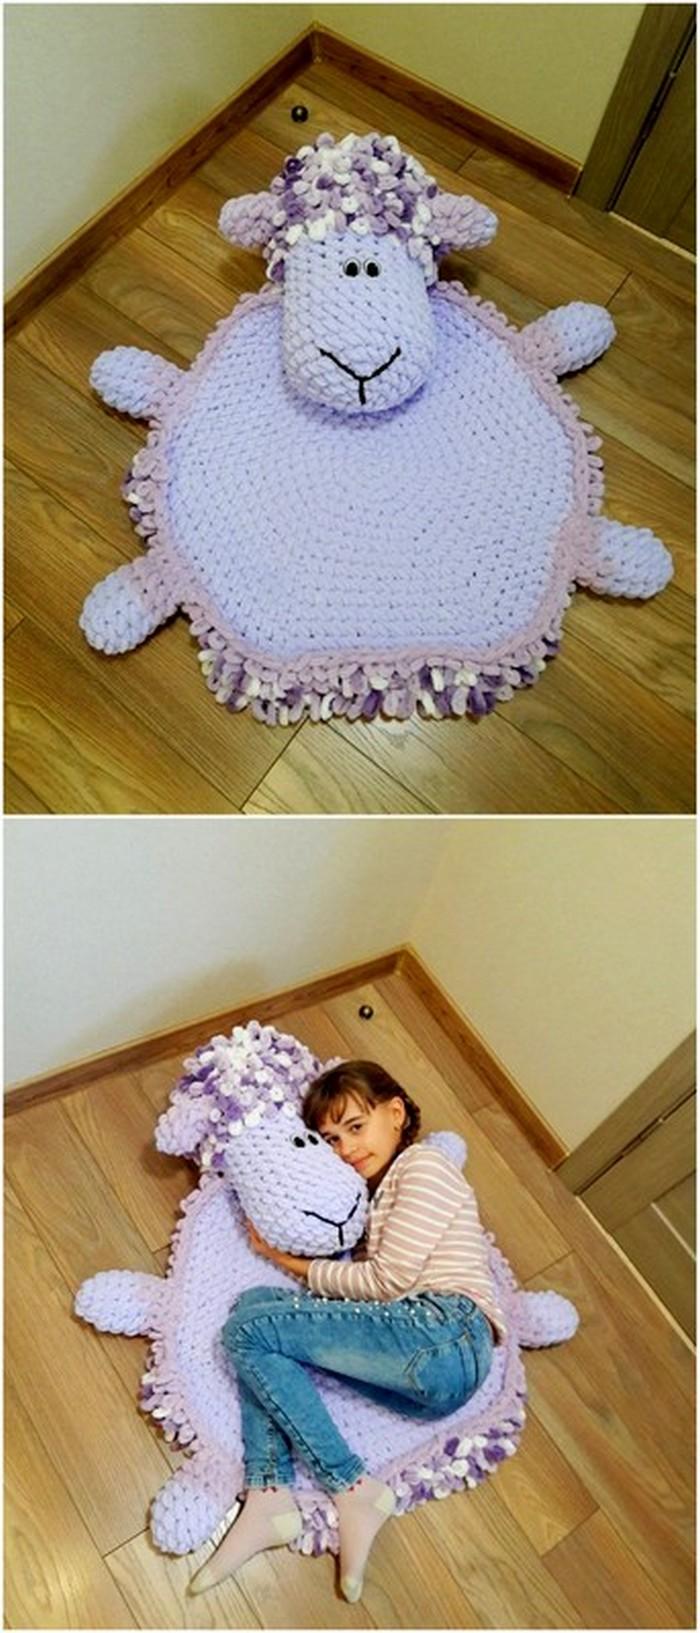 fascinating crochet project design